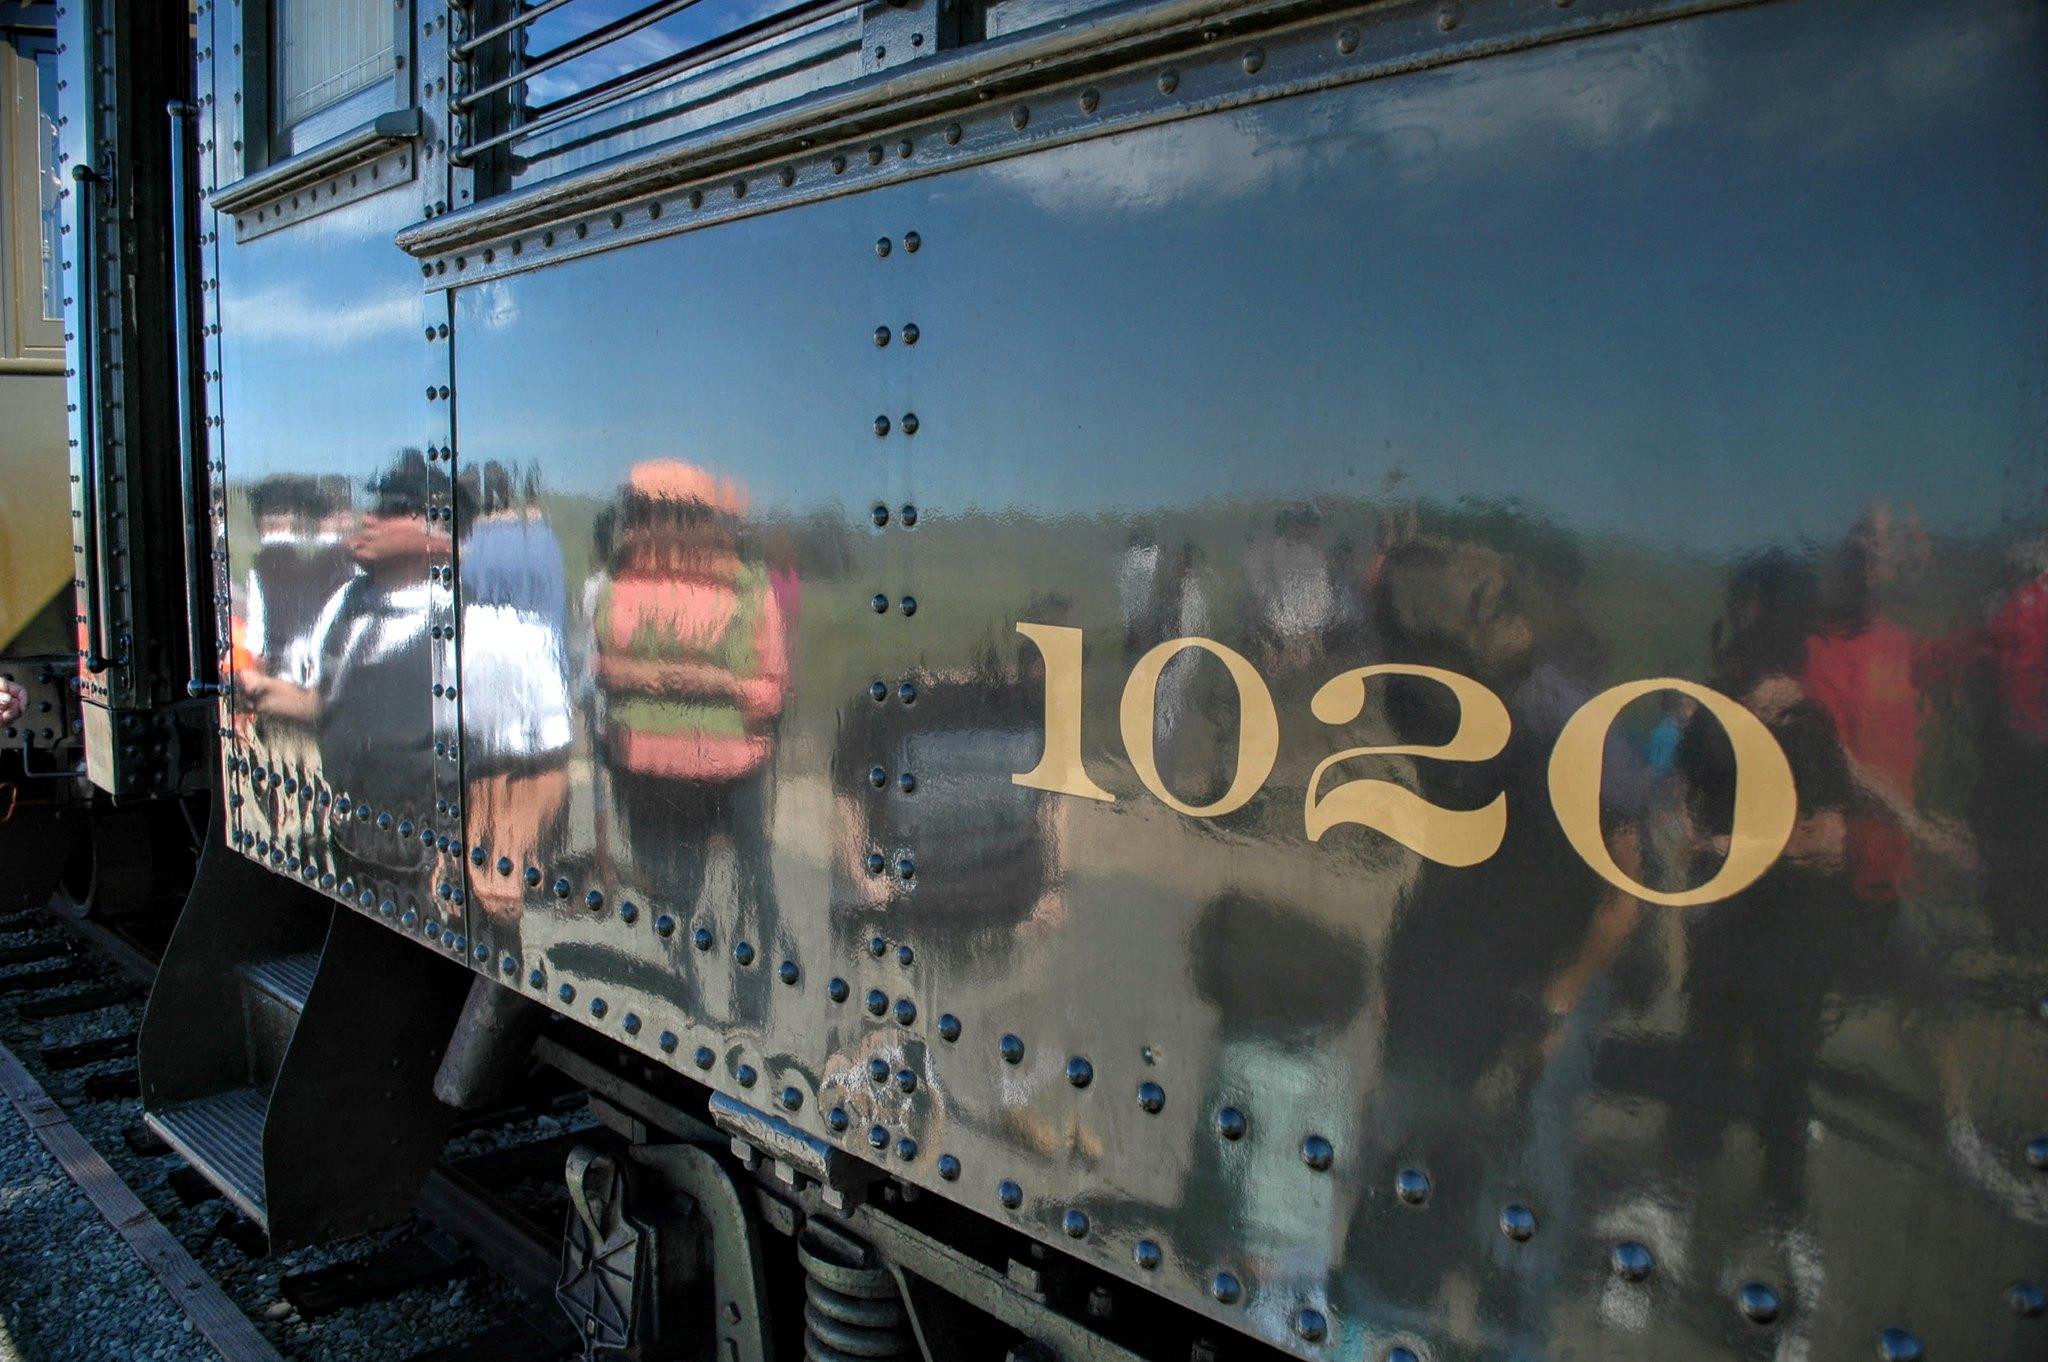 2016 Western Railway Museum Field Trip